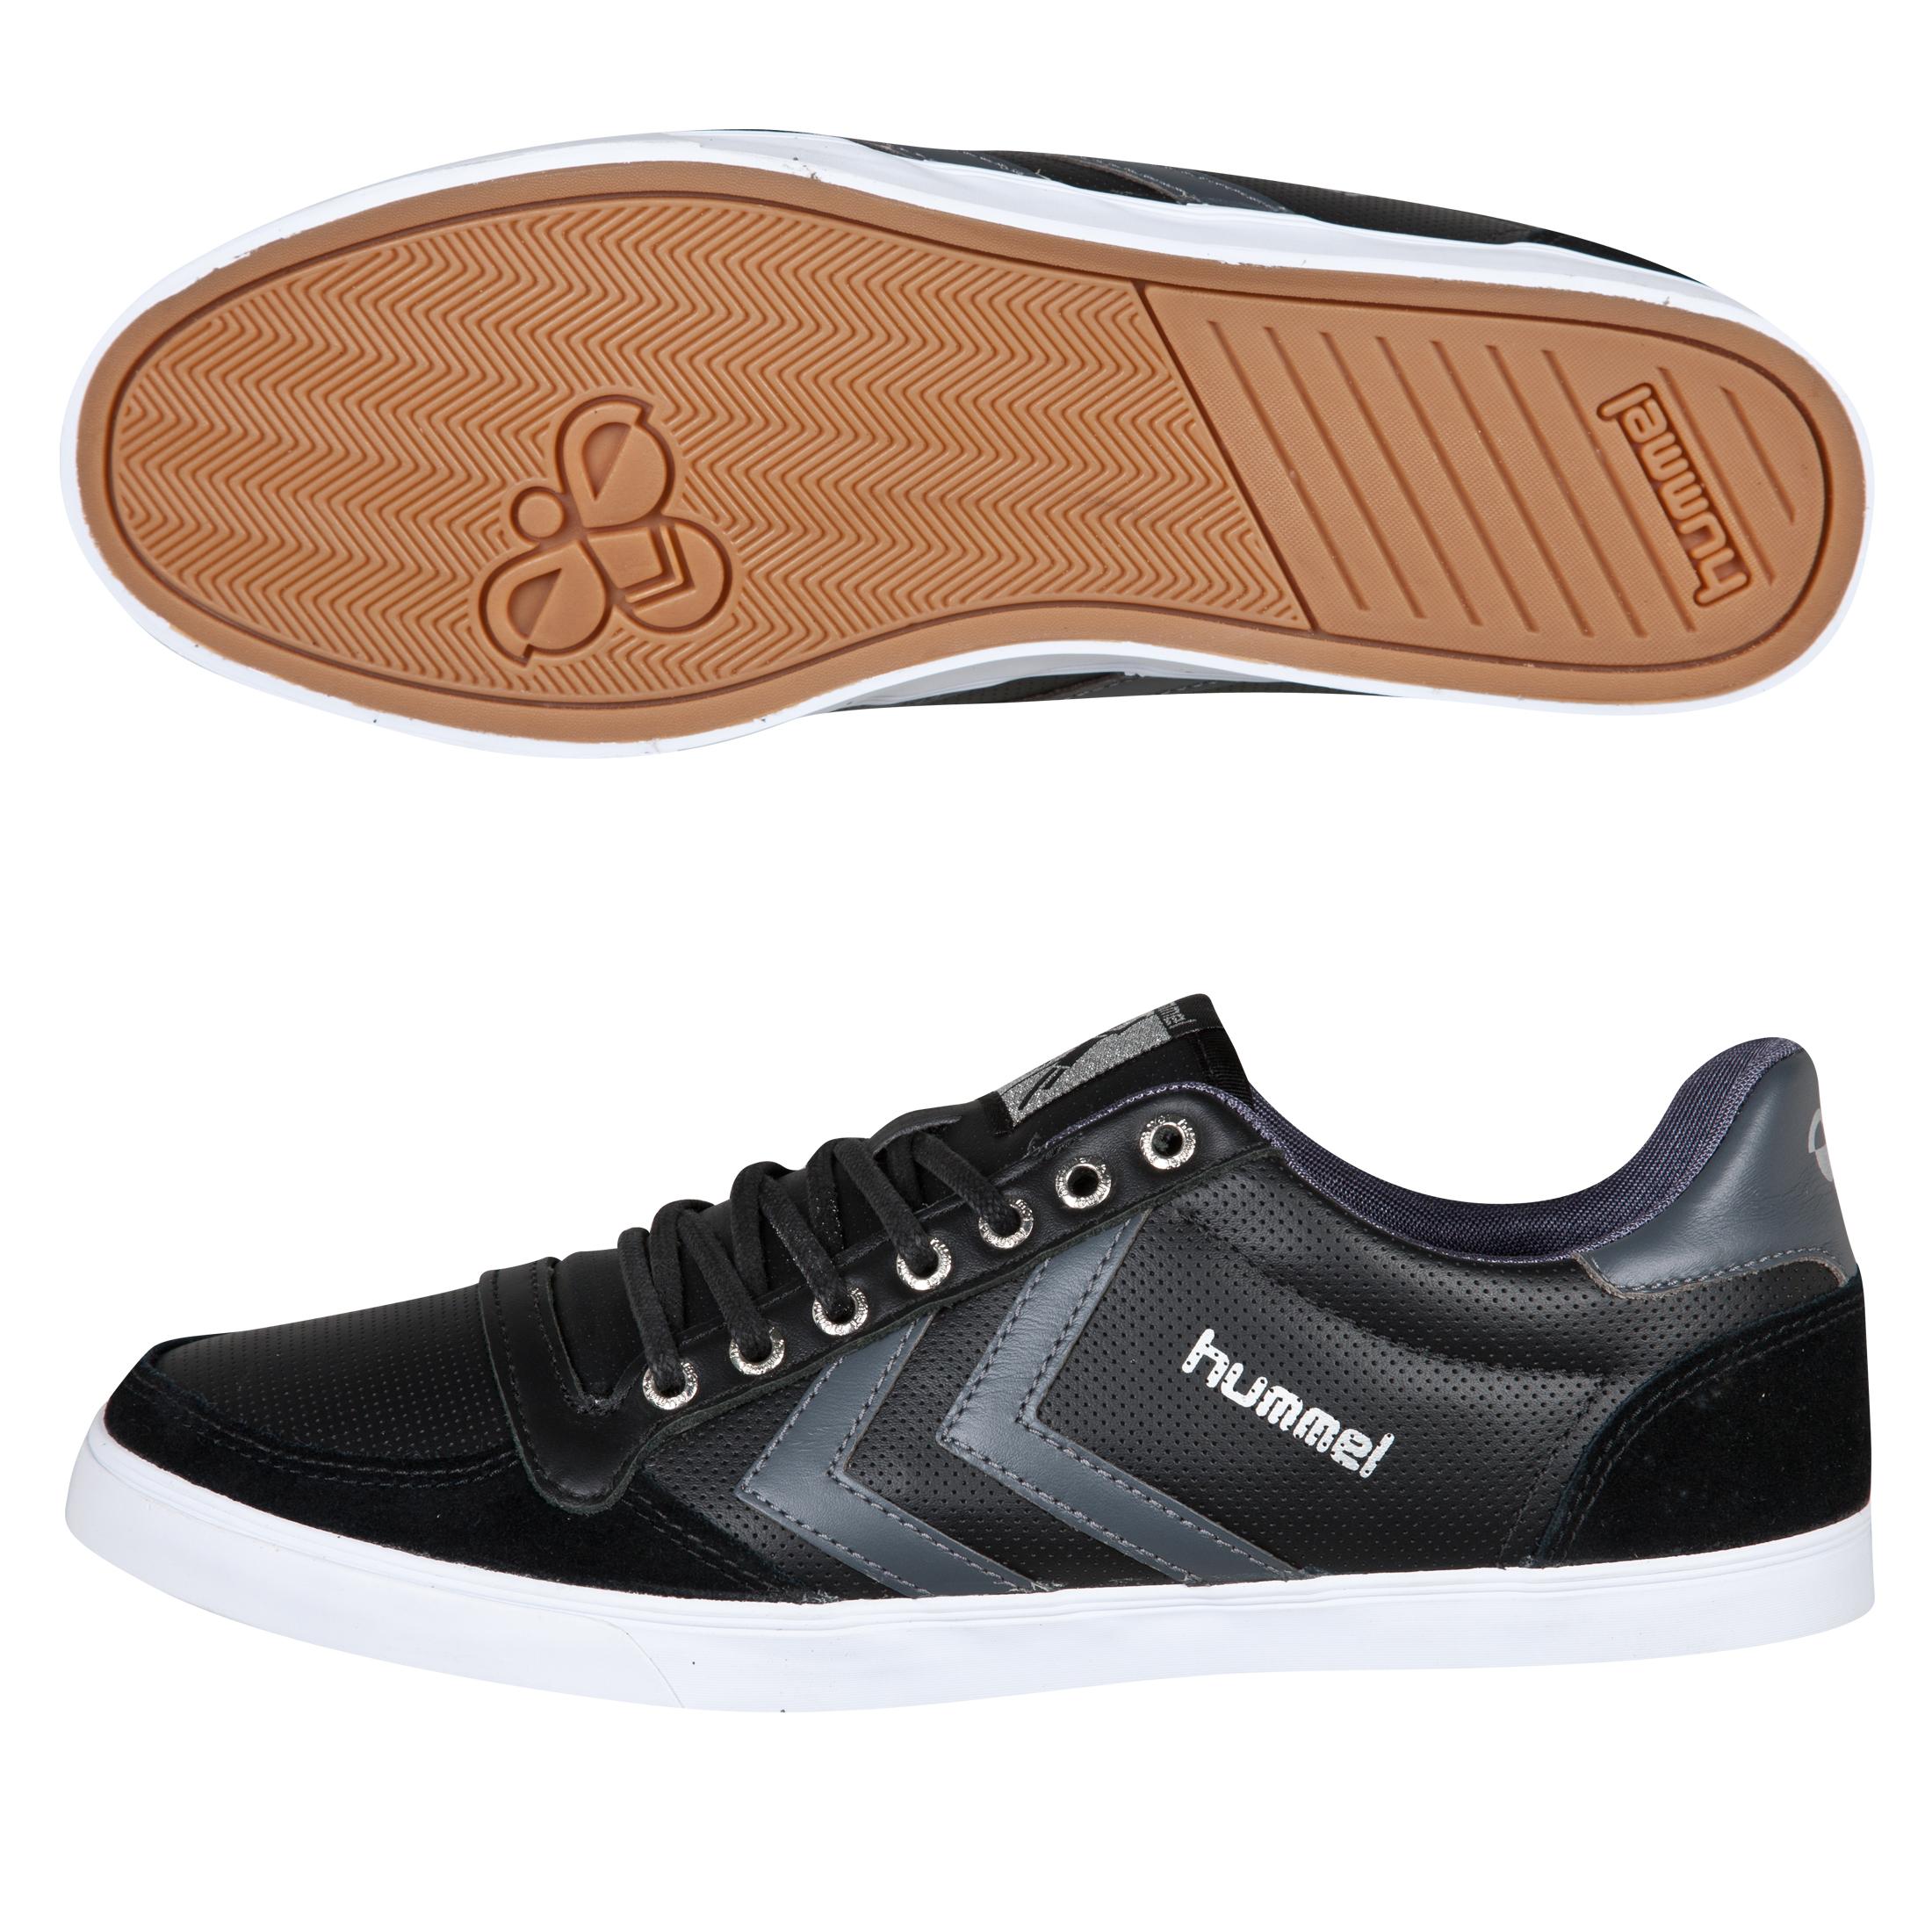 Hummel Slimmer Stadil Low Perf Leather Trainers - Black/Castlerock